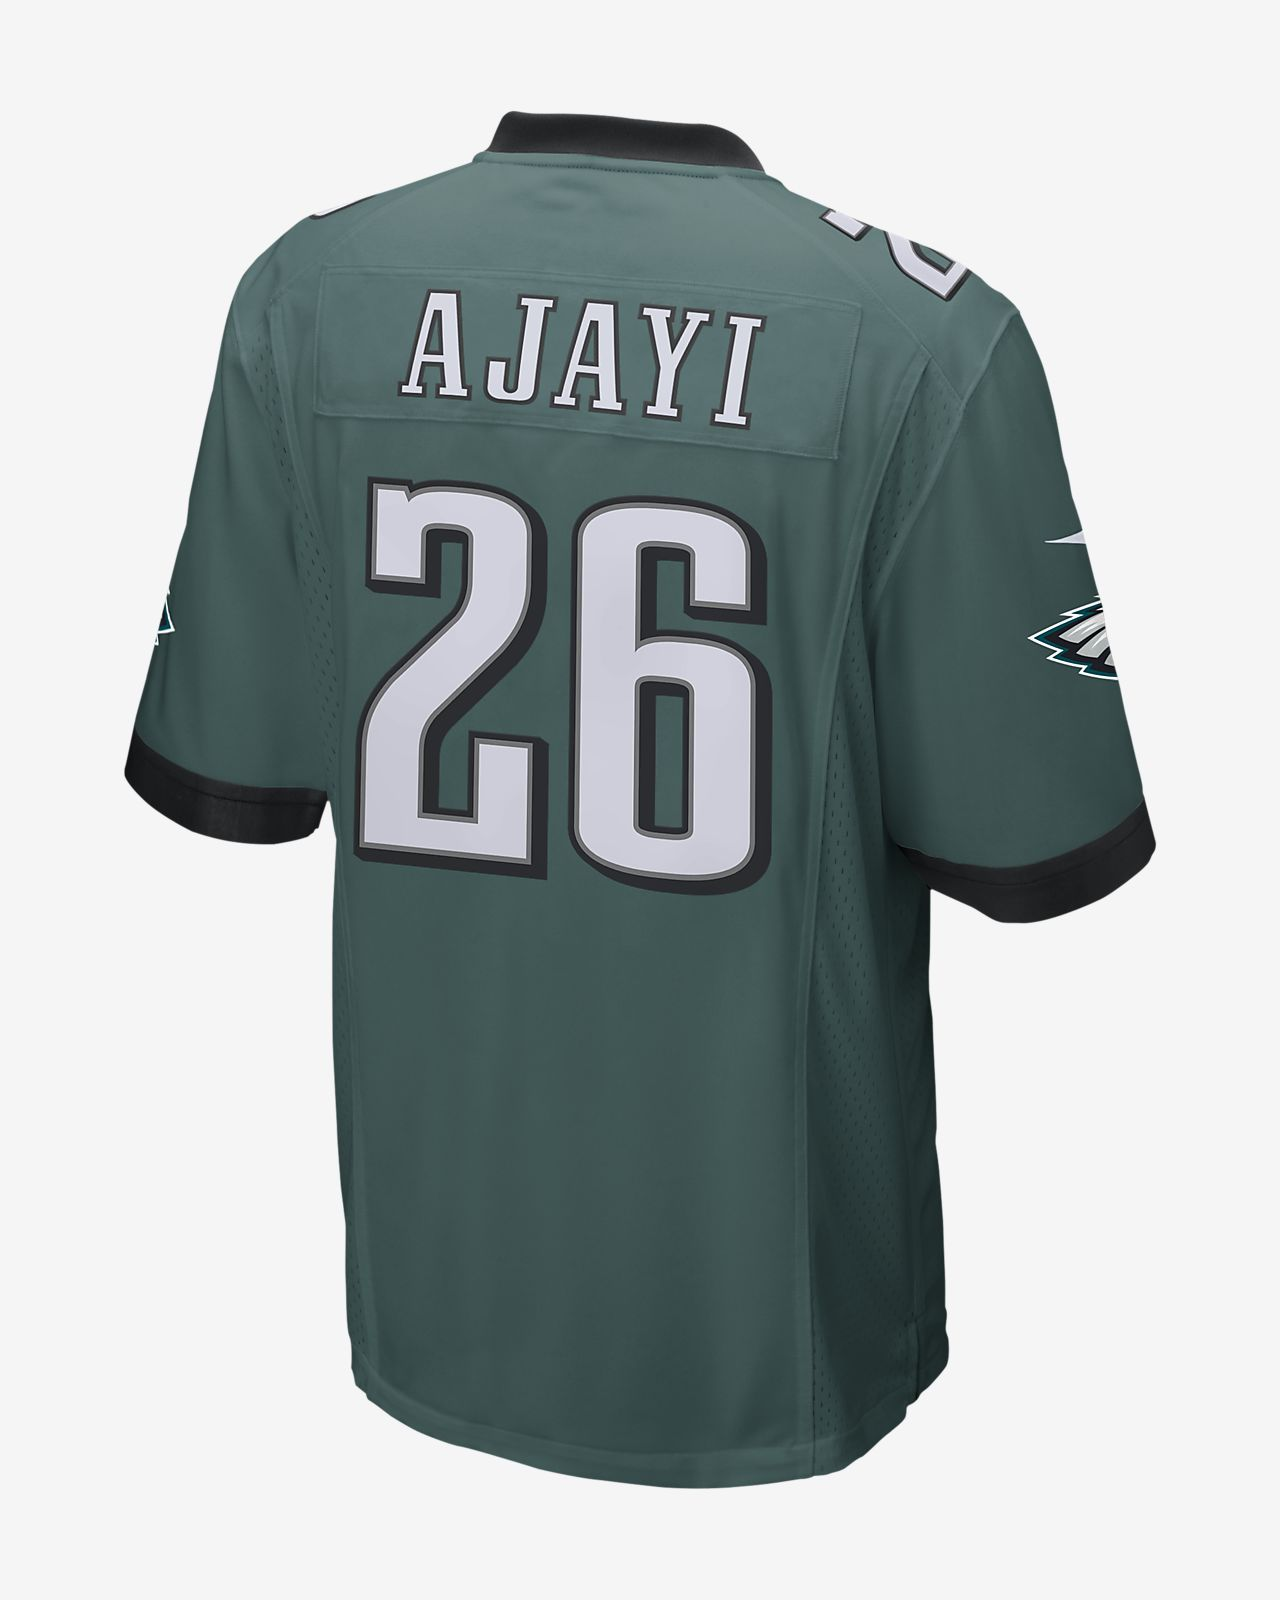 huge discount 980e7 172de NFL Philadelphia Eagles (Jay Ajayi) Men's Game American Football Jersey